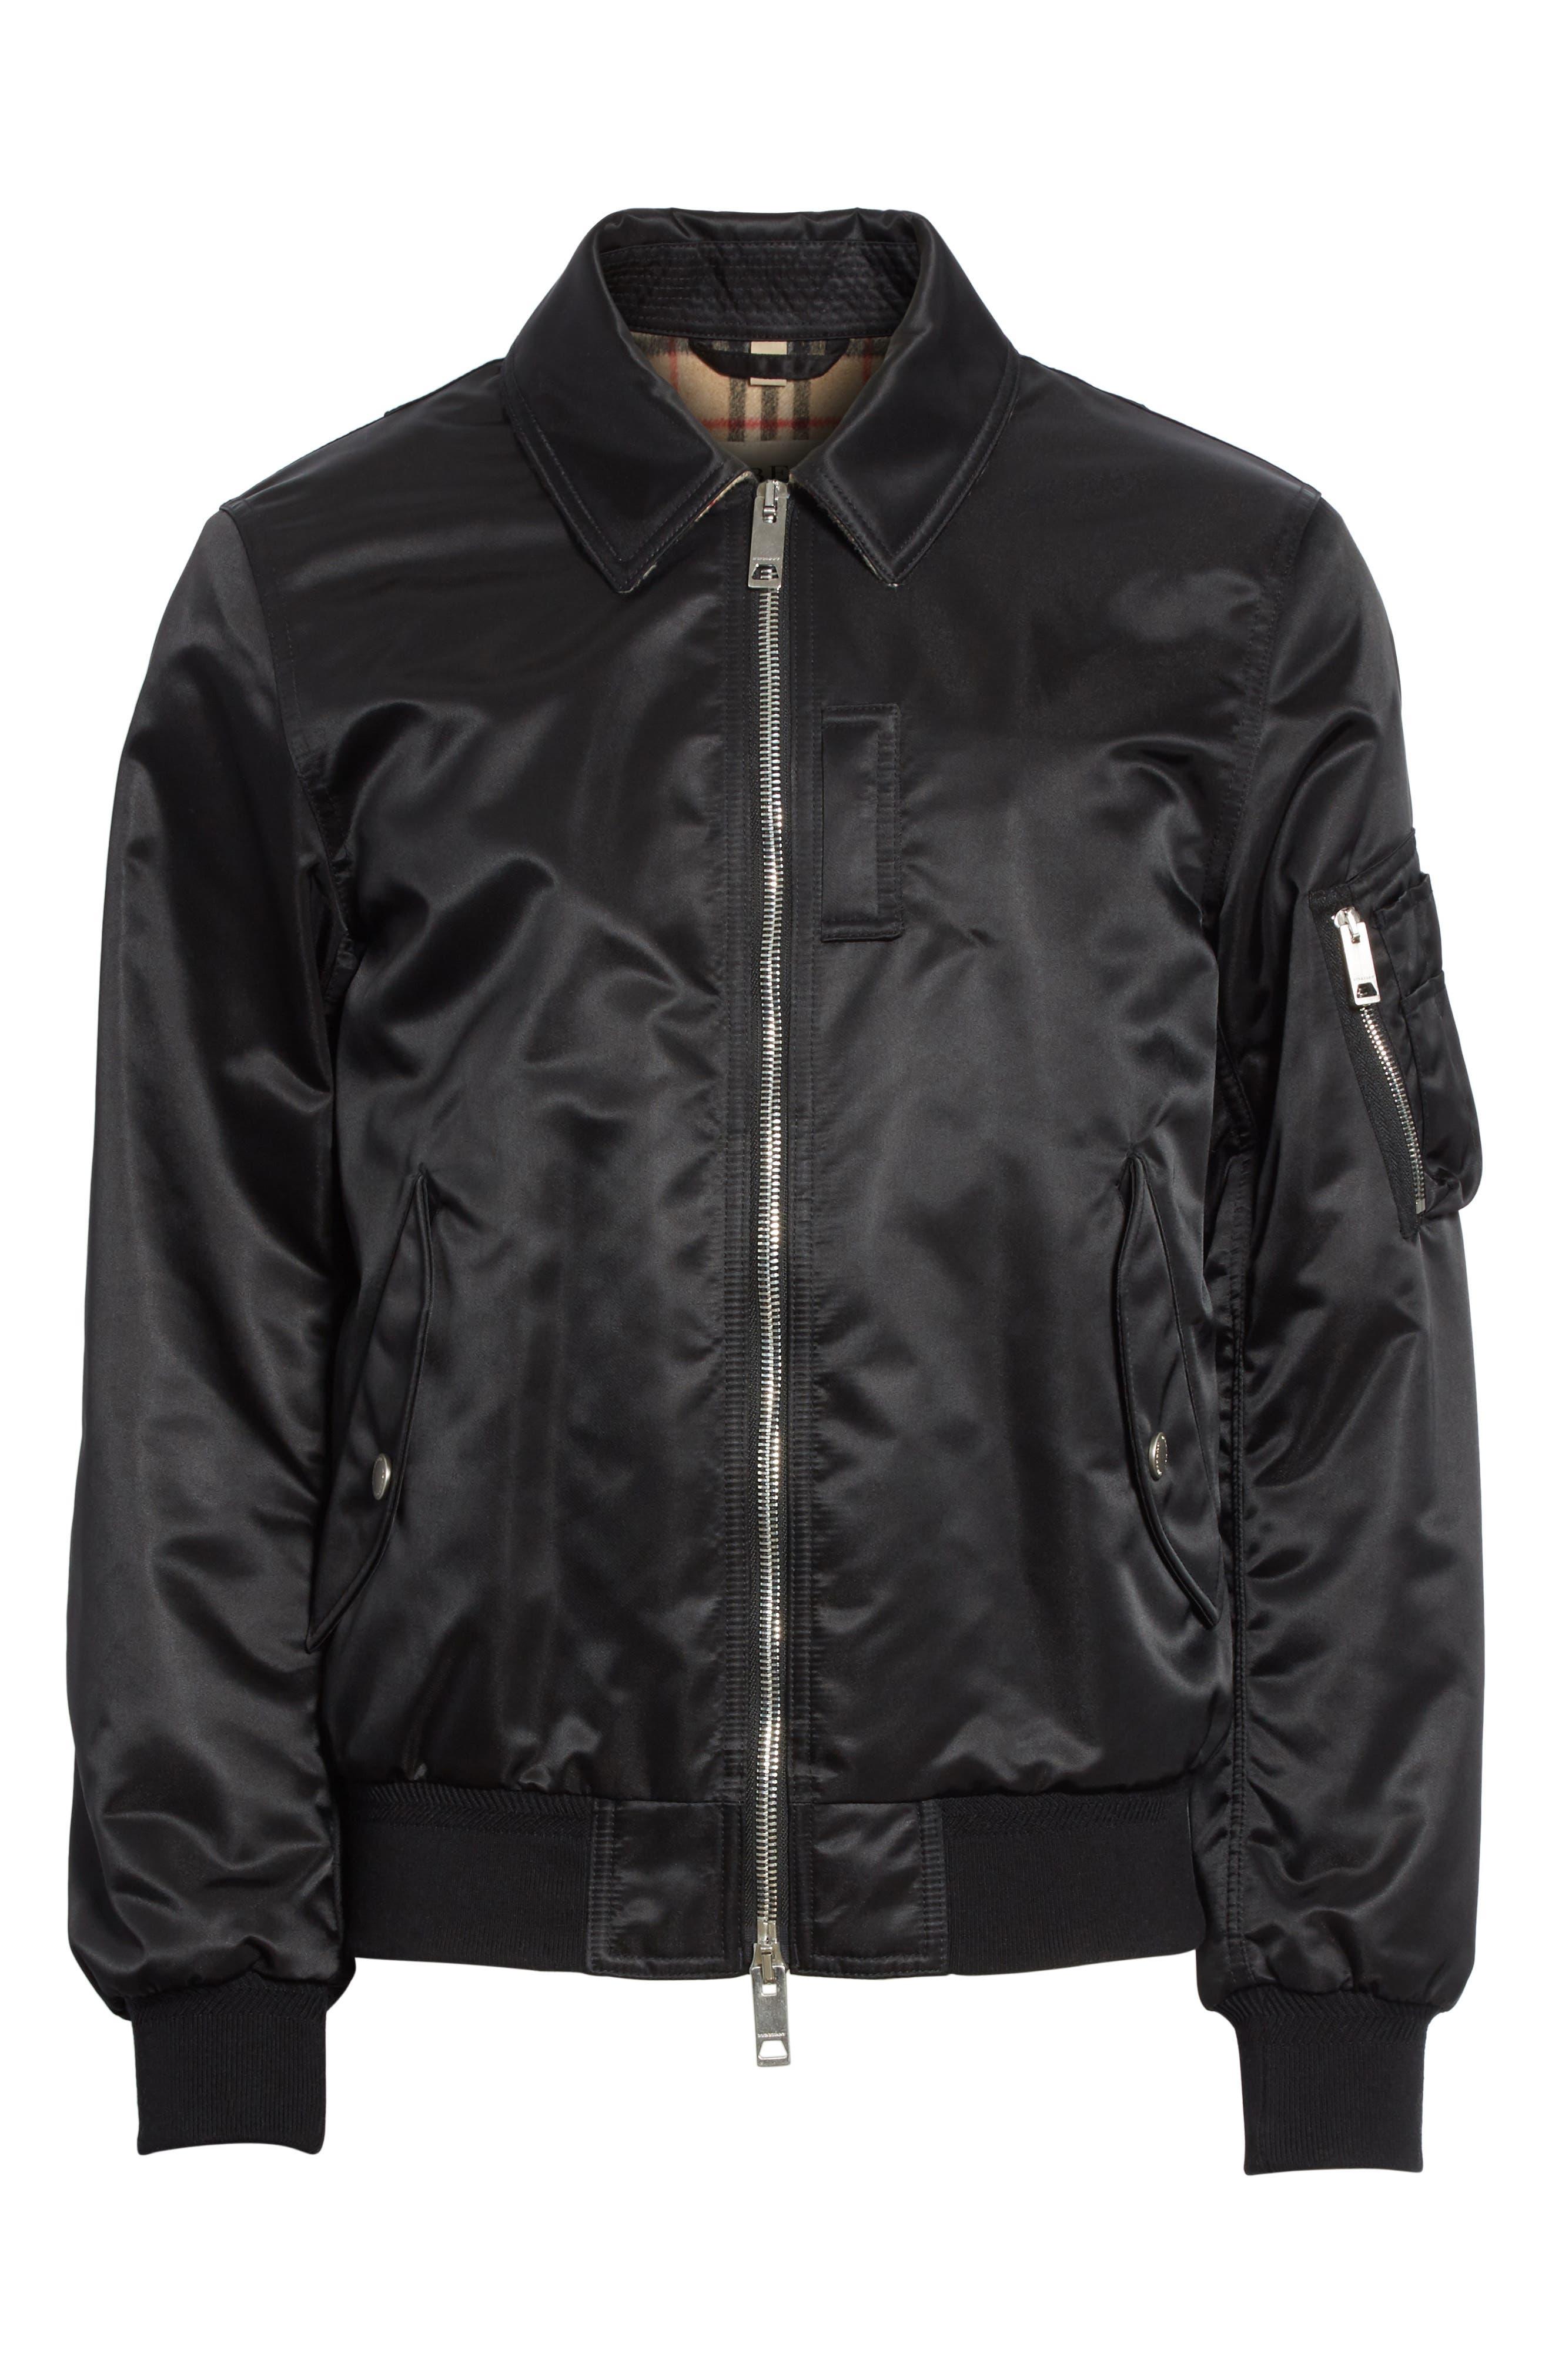 Pipley Spread Collar Bomber Jacket,                             Alternate thumbnail 5, color,                             001